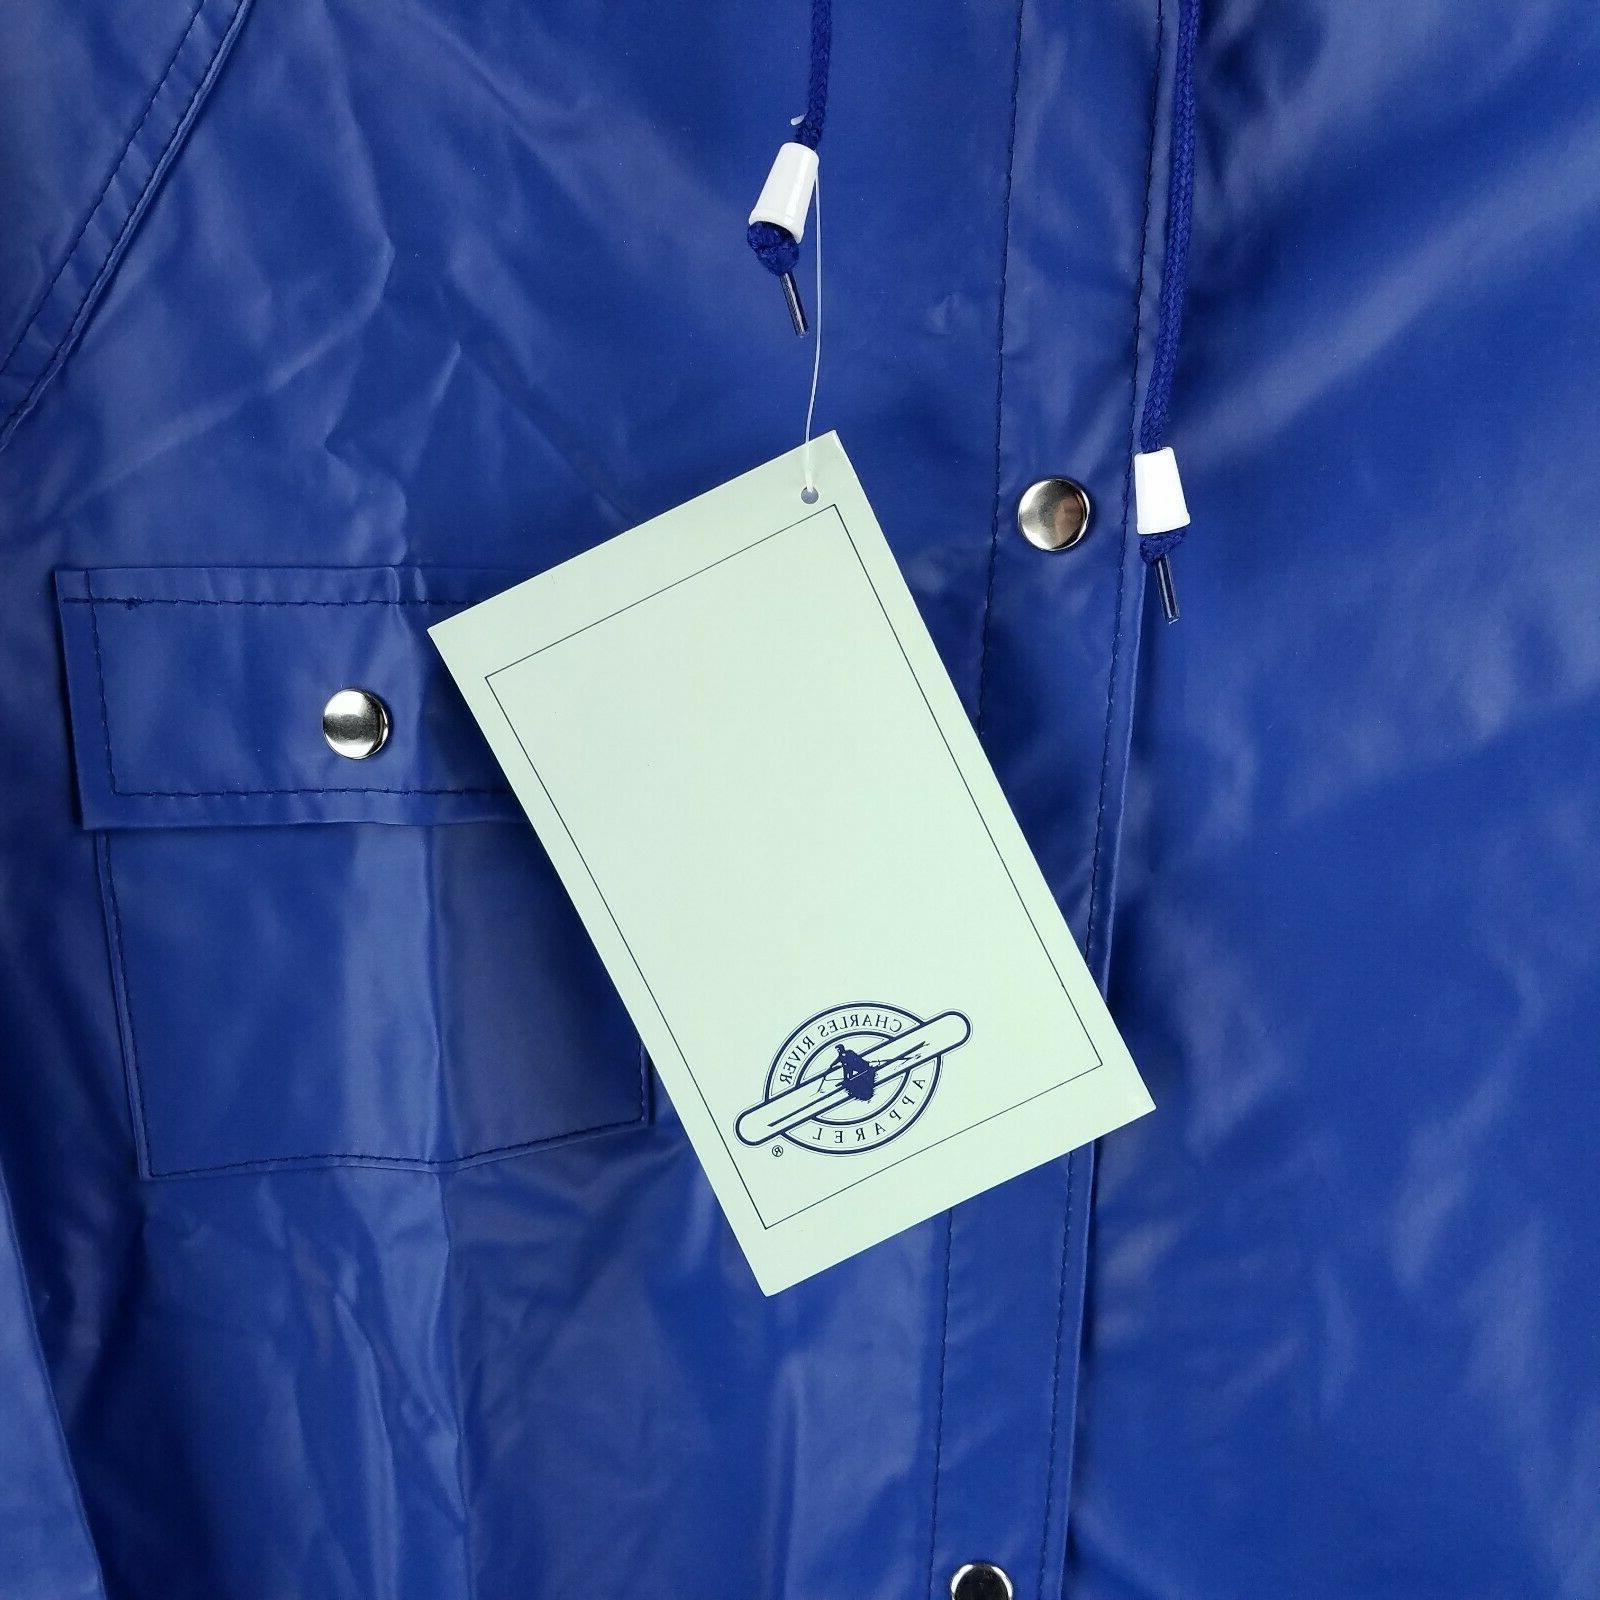 NWT Charles River Apparel Blue Knee Jacket Large